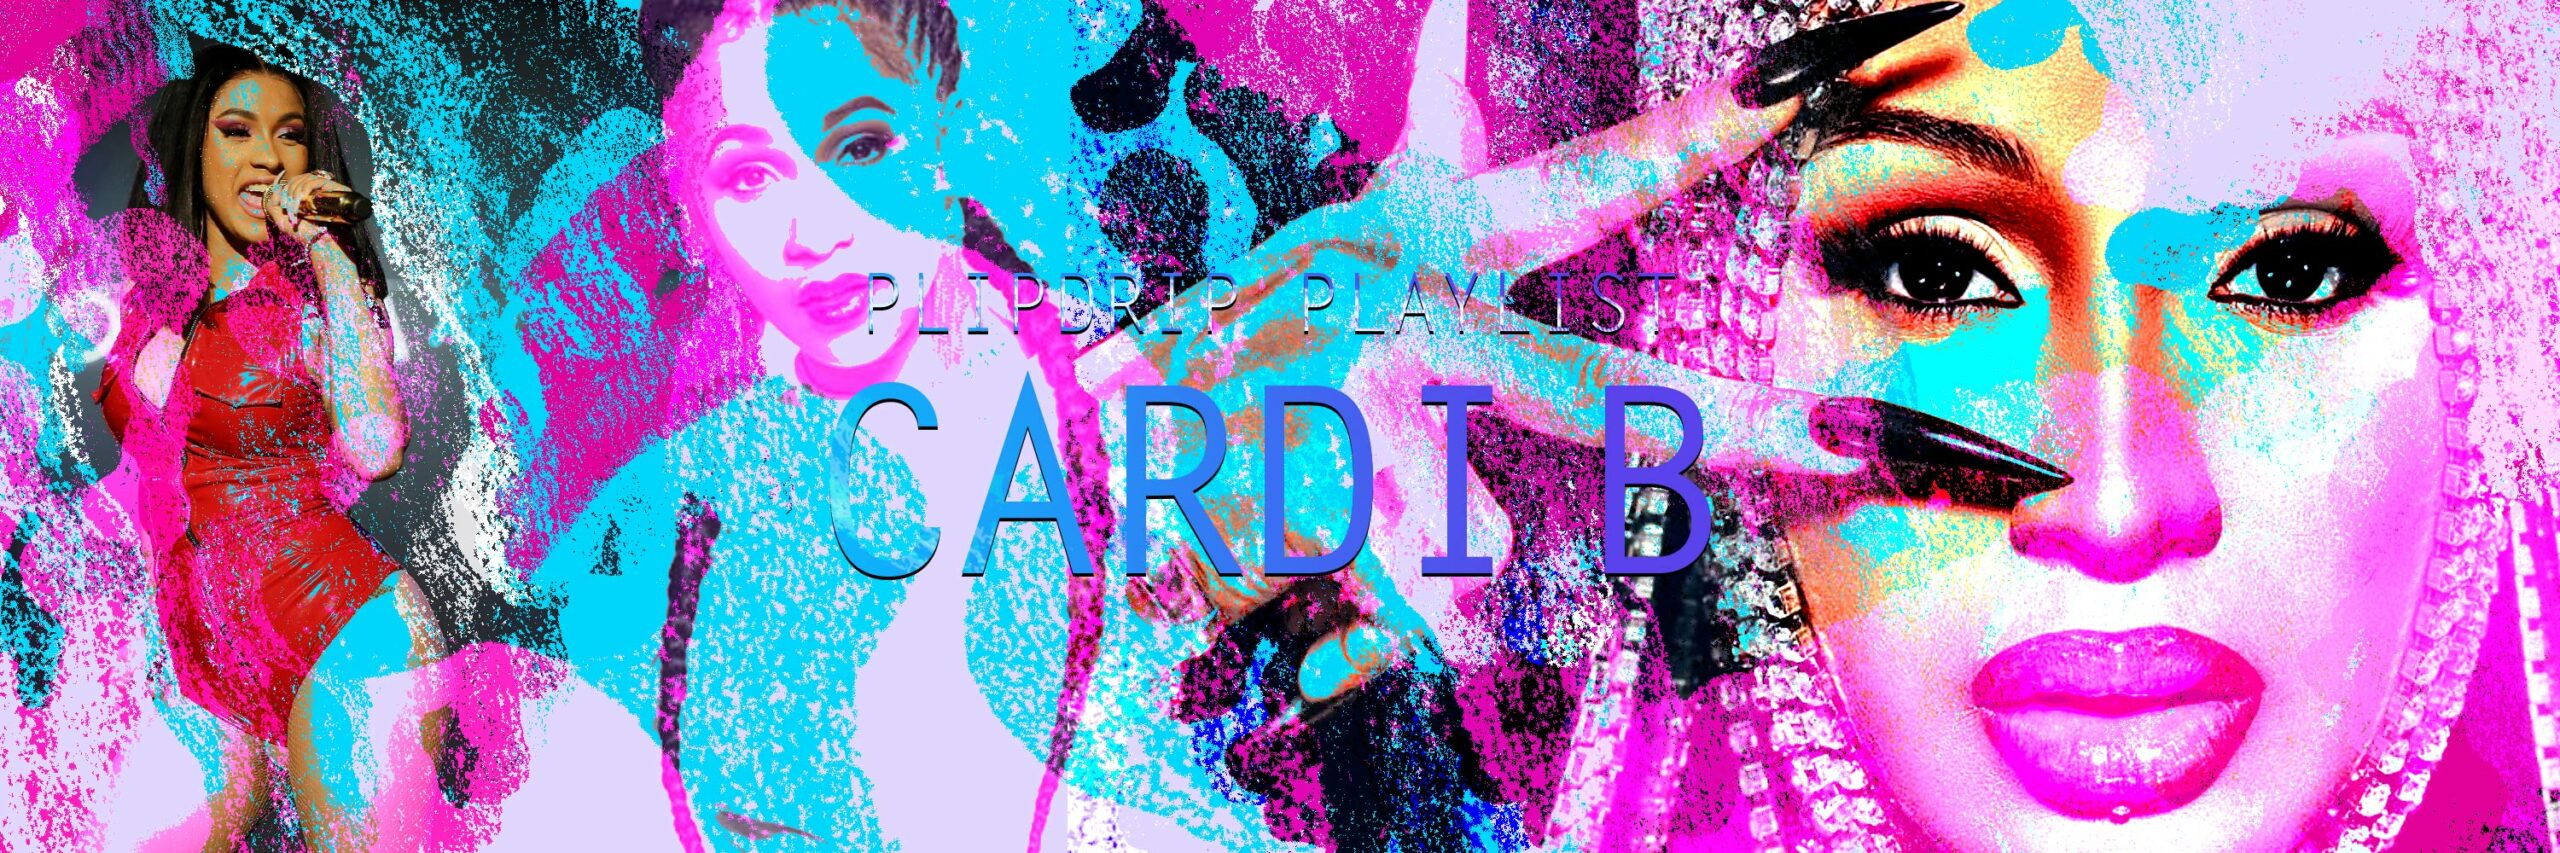 PF-cardi-b-banner-1